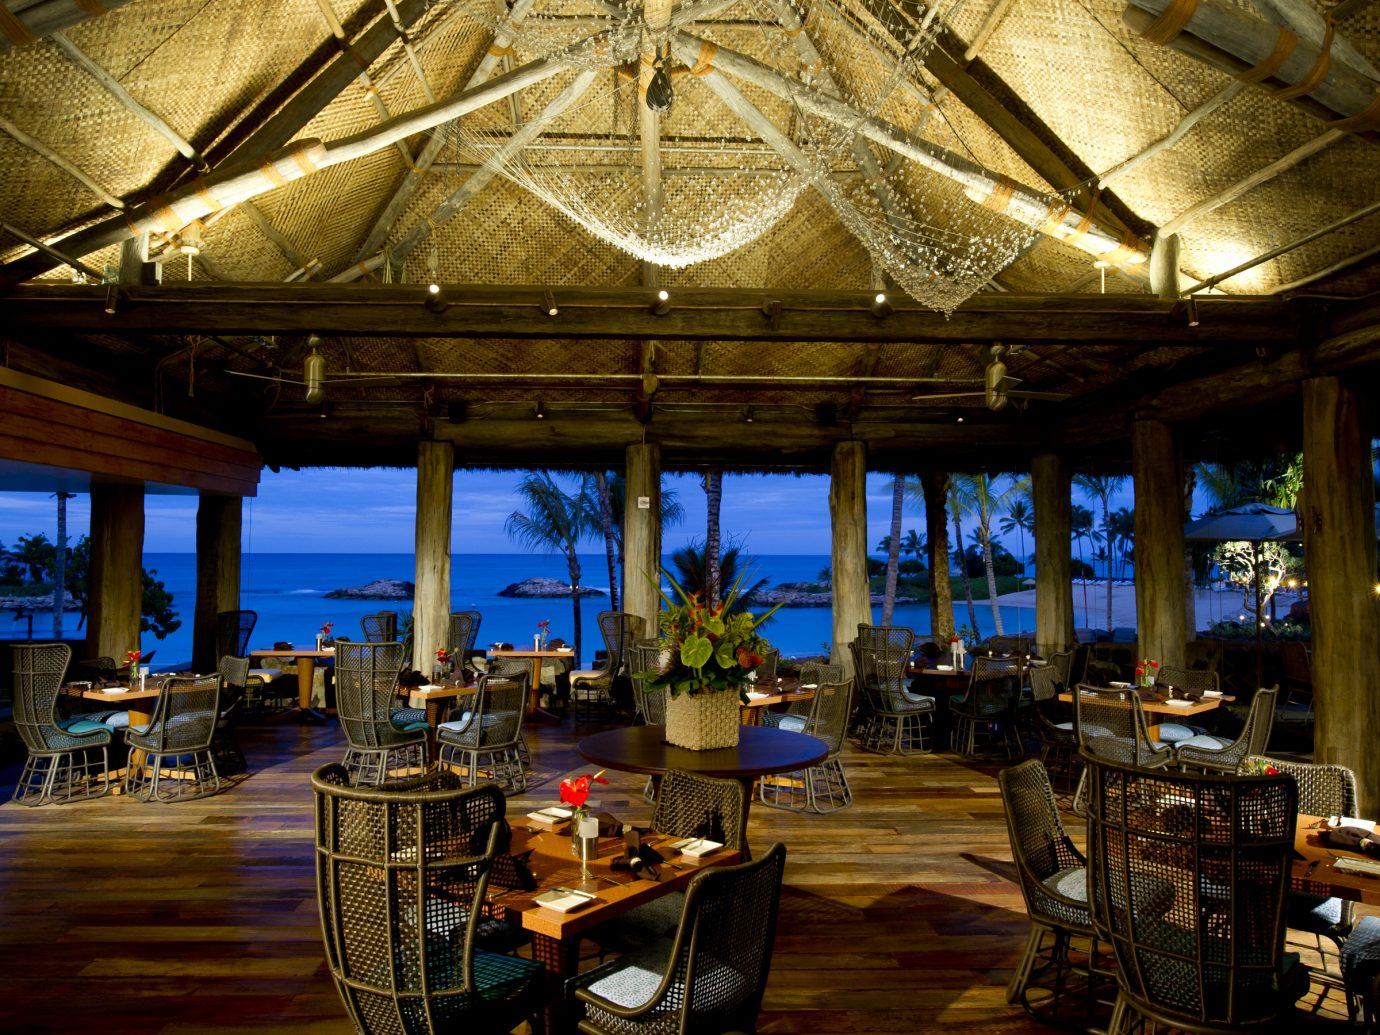 AMA'AMA BEACH RESTAURANT at Aulani Resort